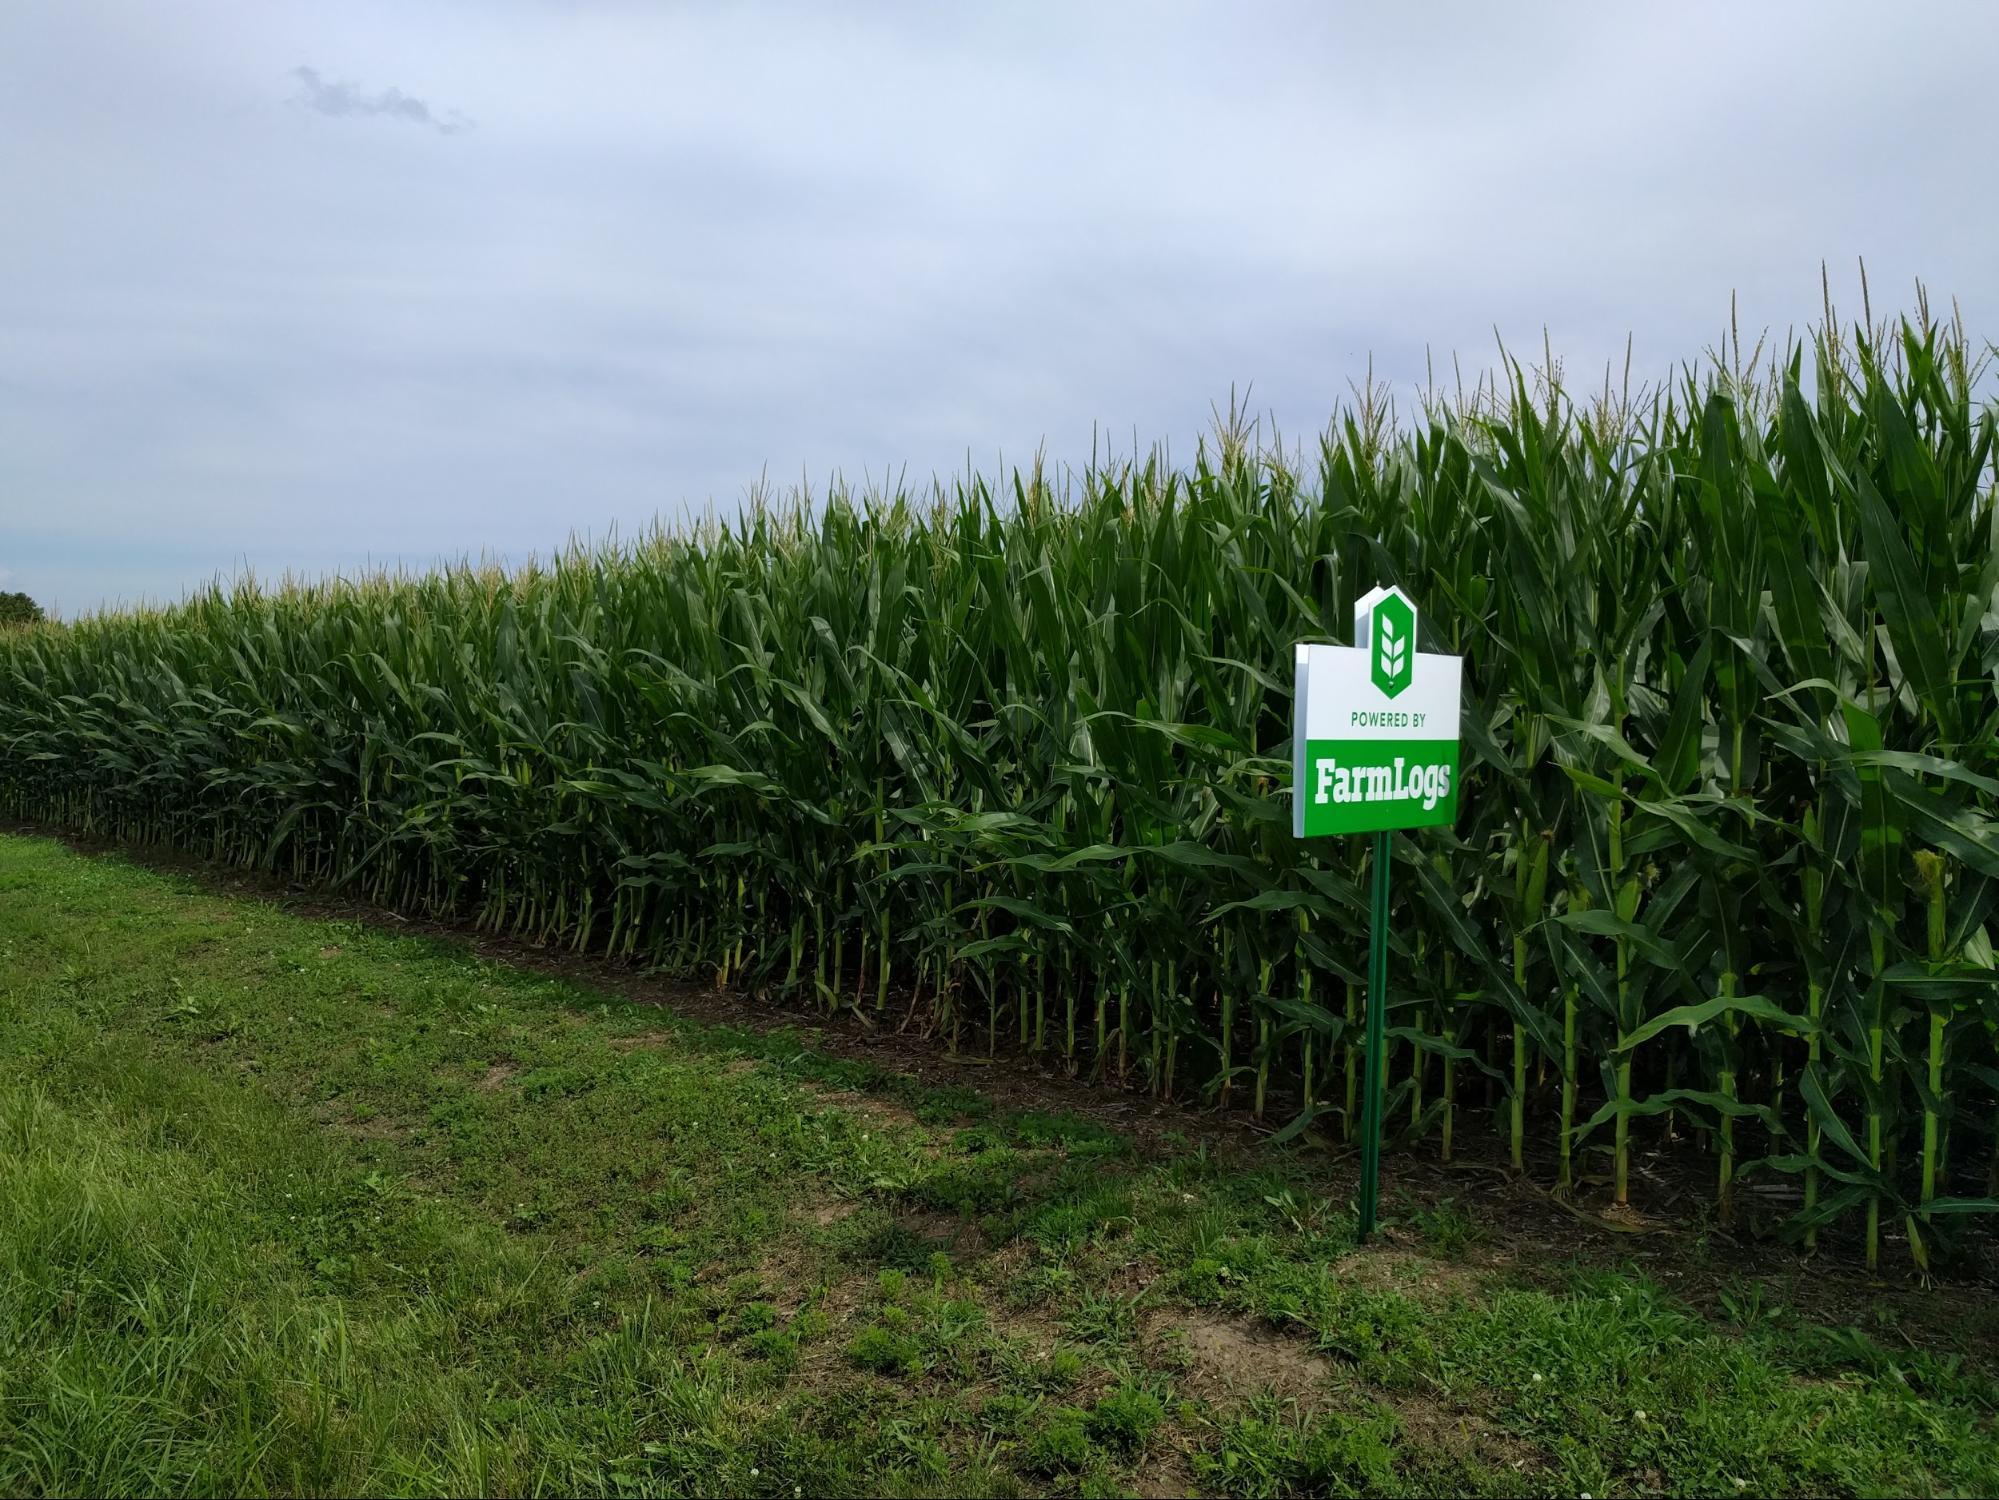 corn field with FarmLogs sign